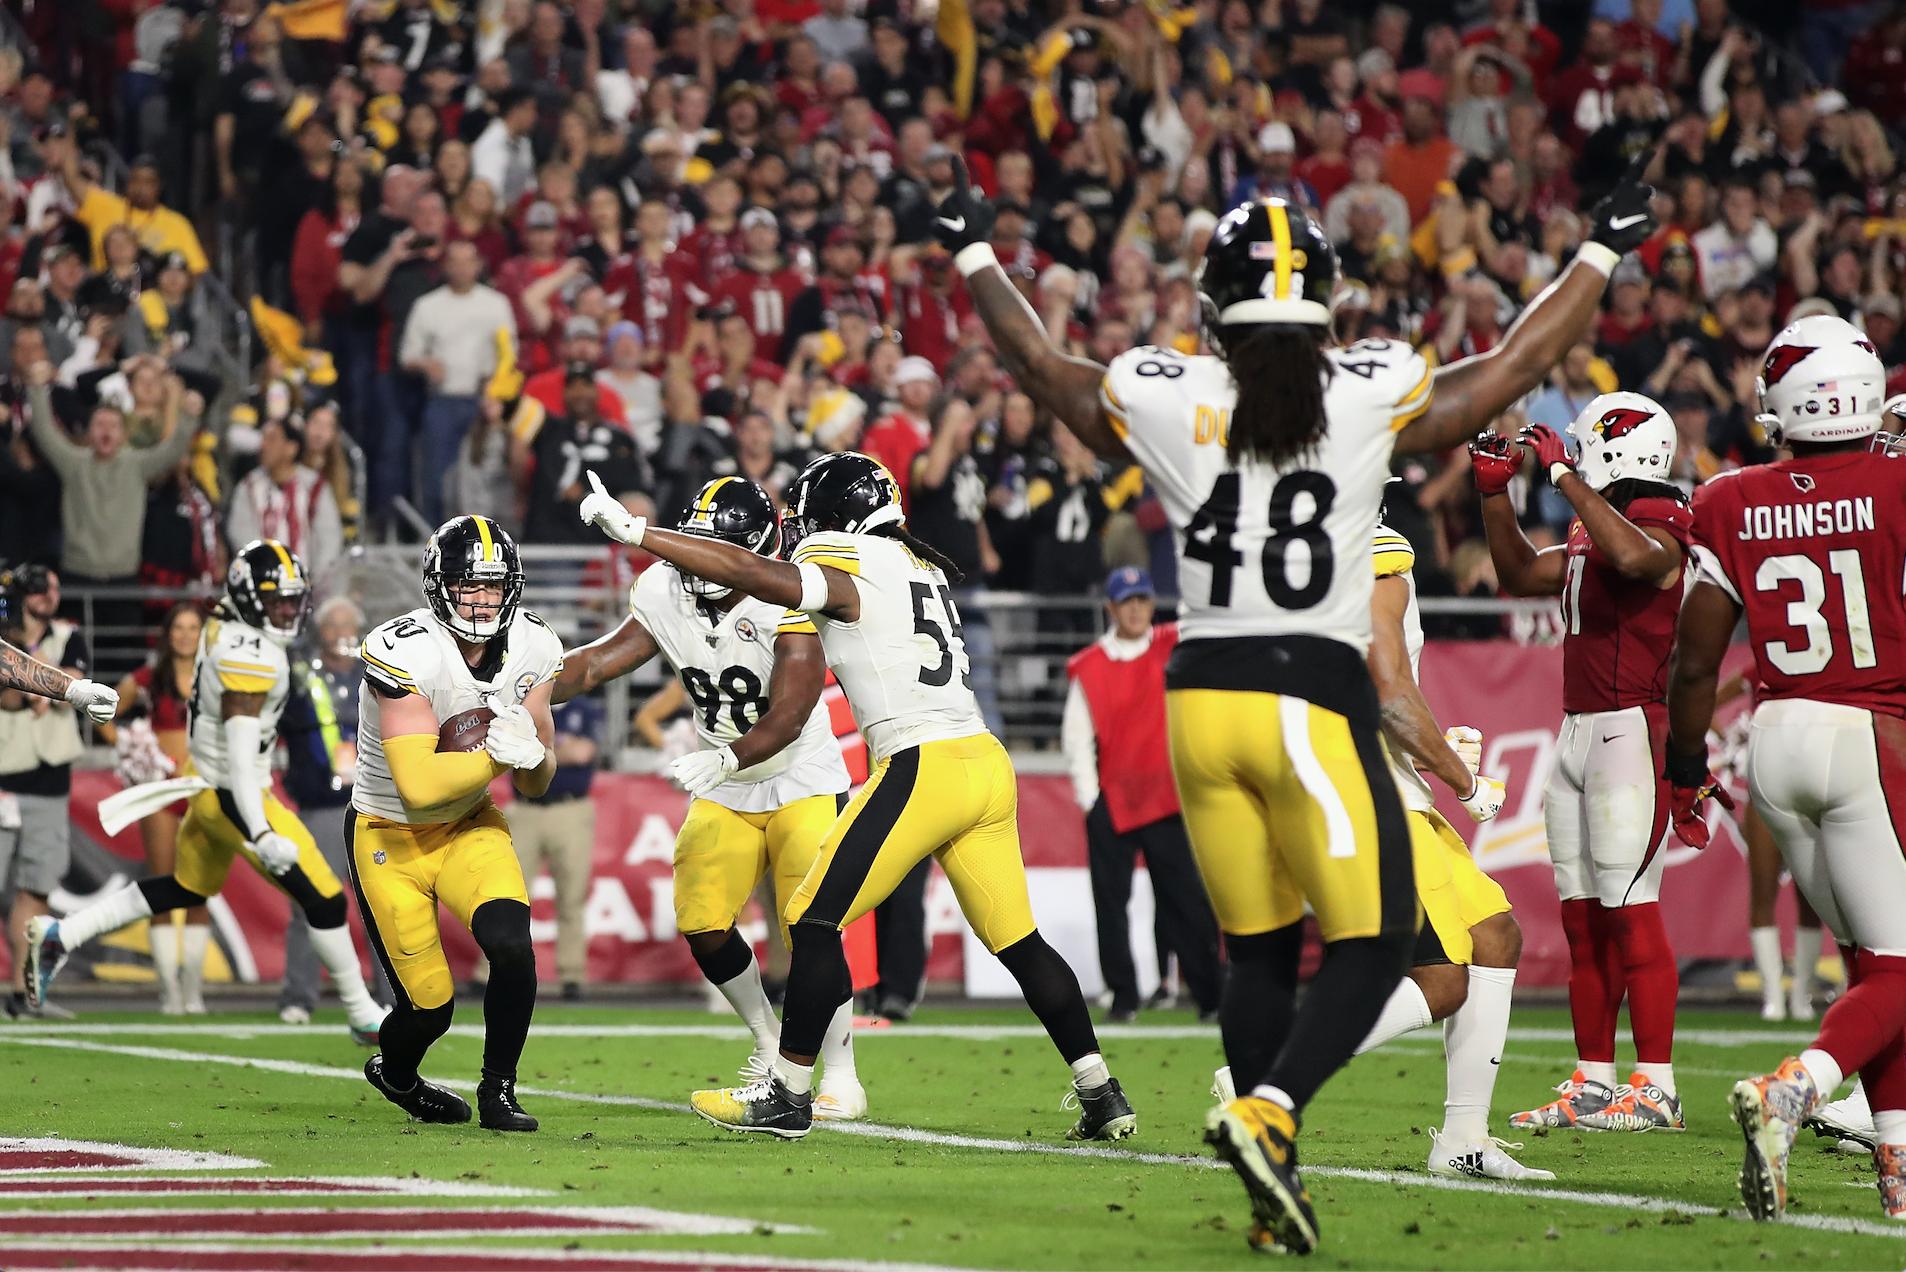 Football Christian Petersen/Getty Images